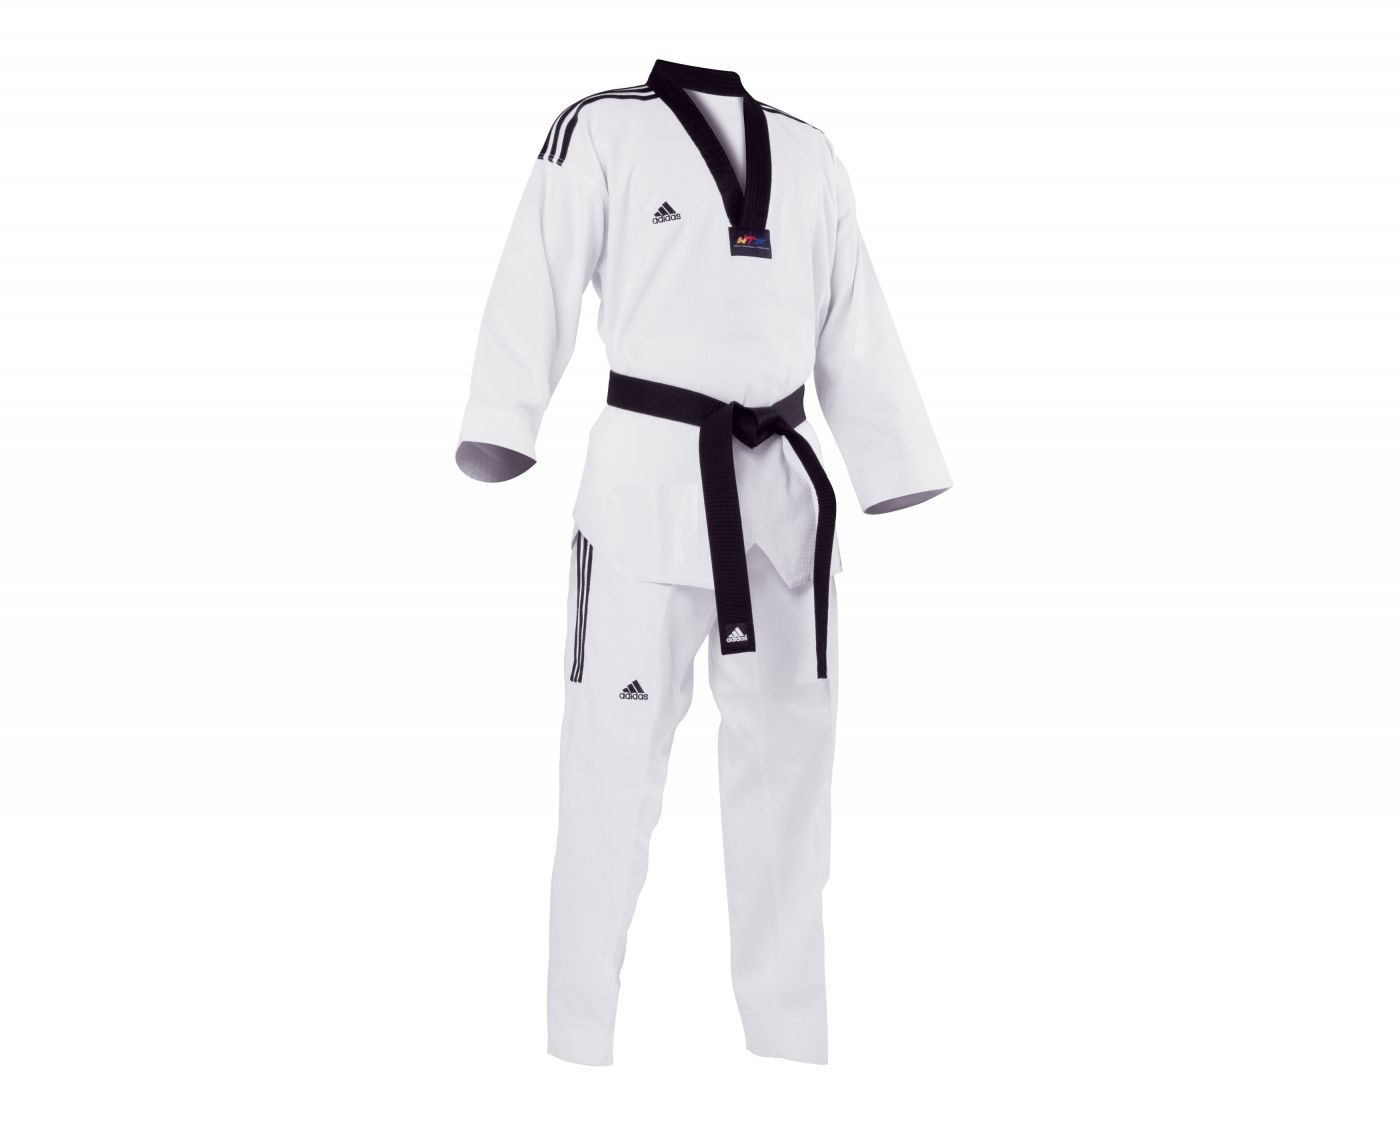 Униформа для Тэквон-до Adidas WTF Adi-GrandMaster 3 белый с черным воротником, размер 210 см, артикул adiTGM01-WH/BK